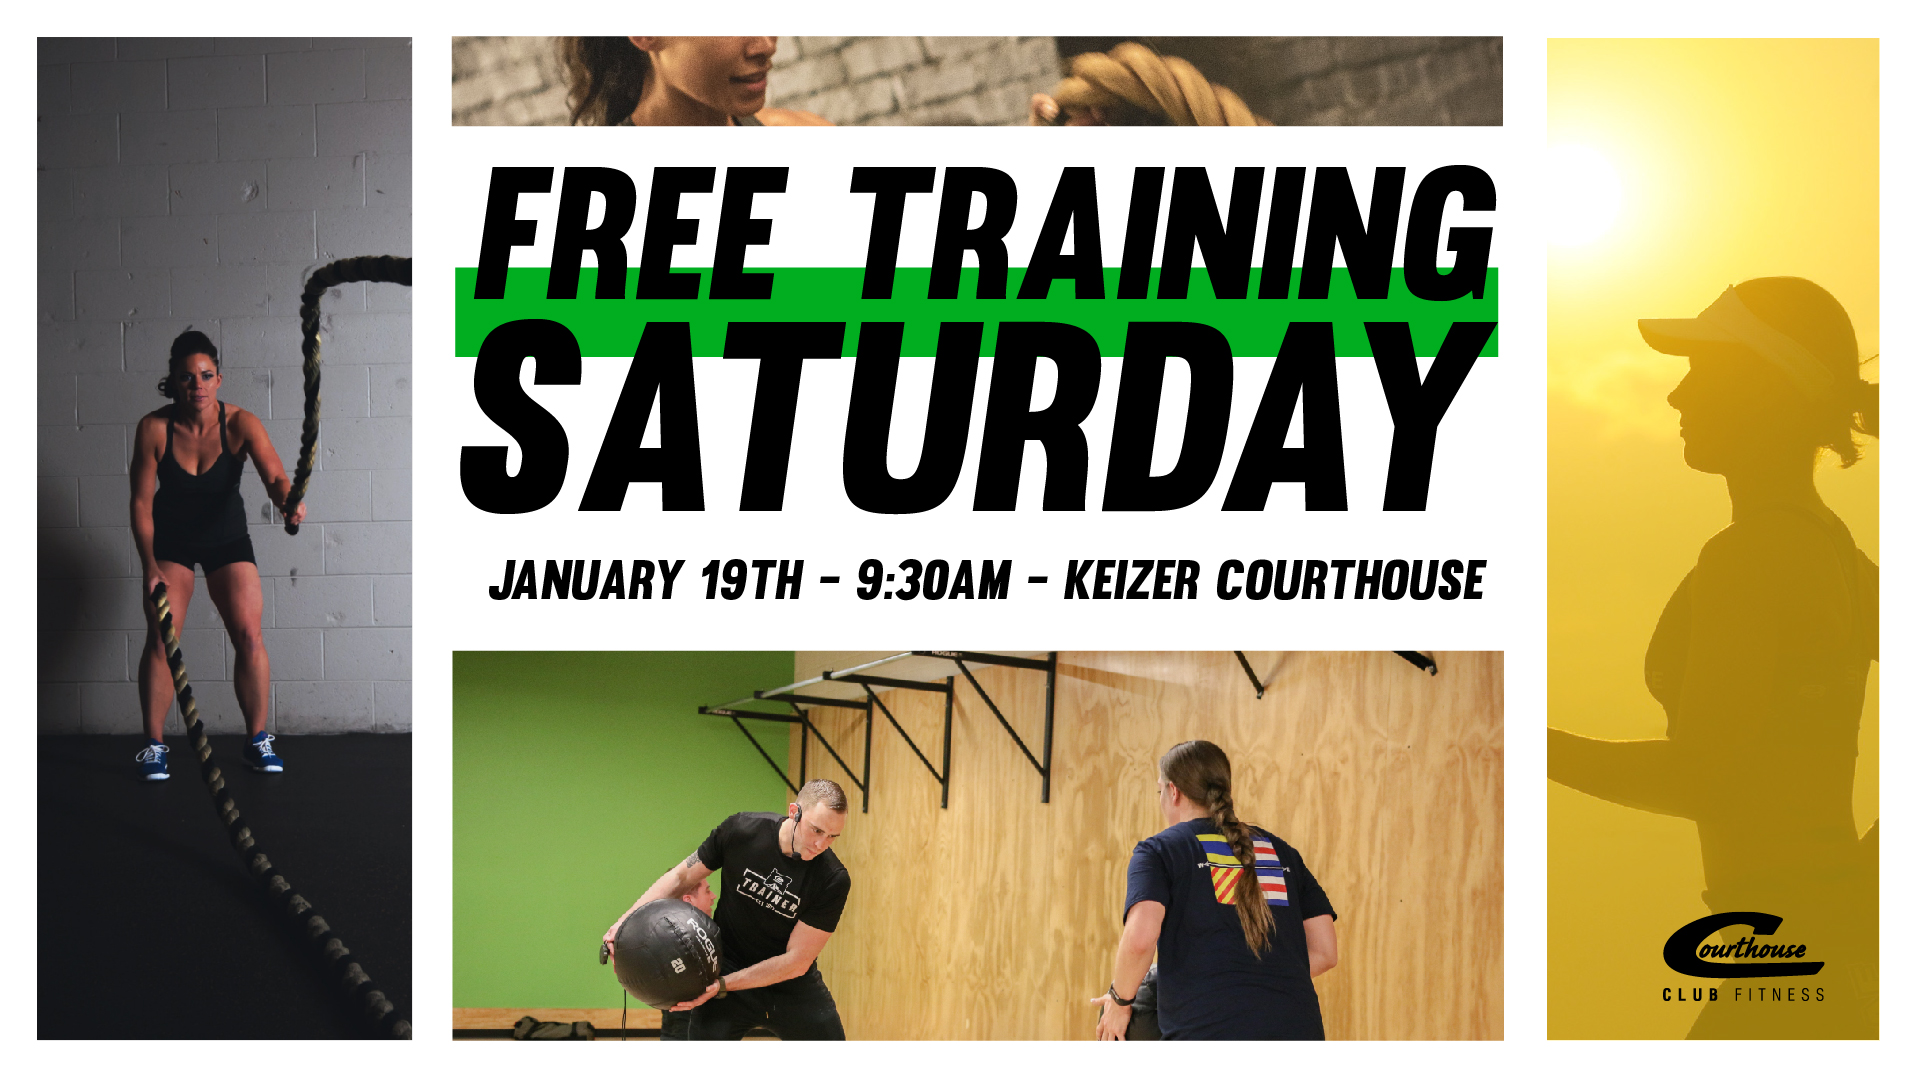 Free_Training_Saturday_Jan_2019_IDS-03.jpg